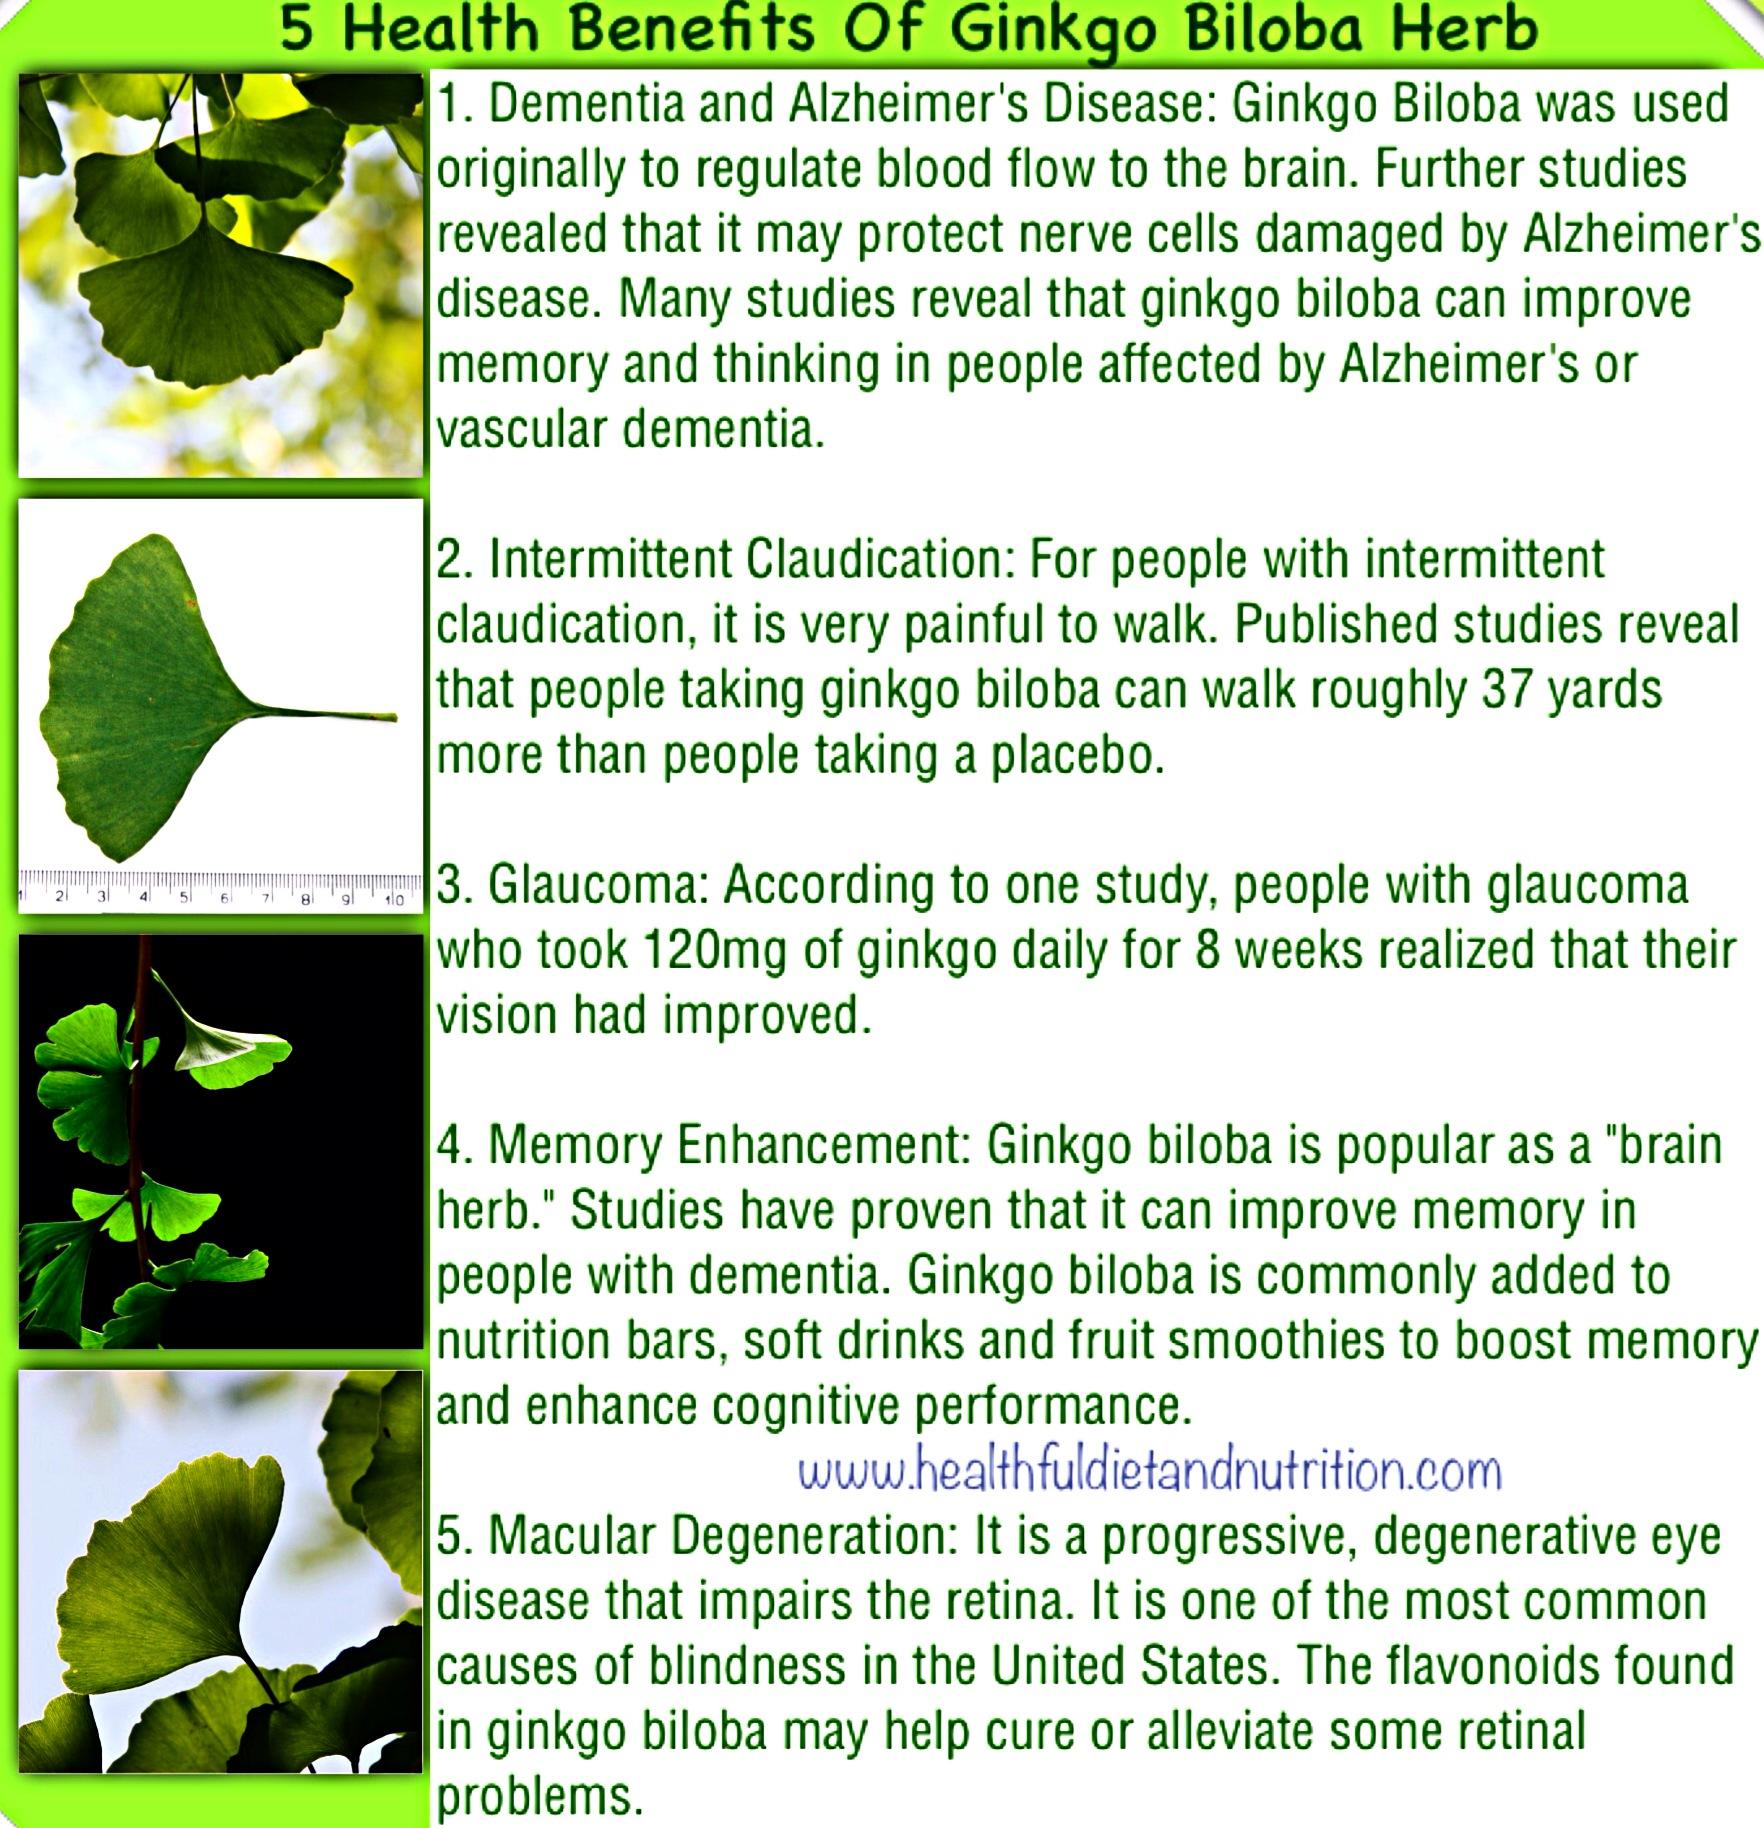 5 Health Benefits of Ginkgo Biloba Herb